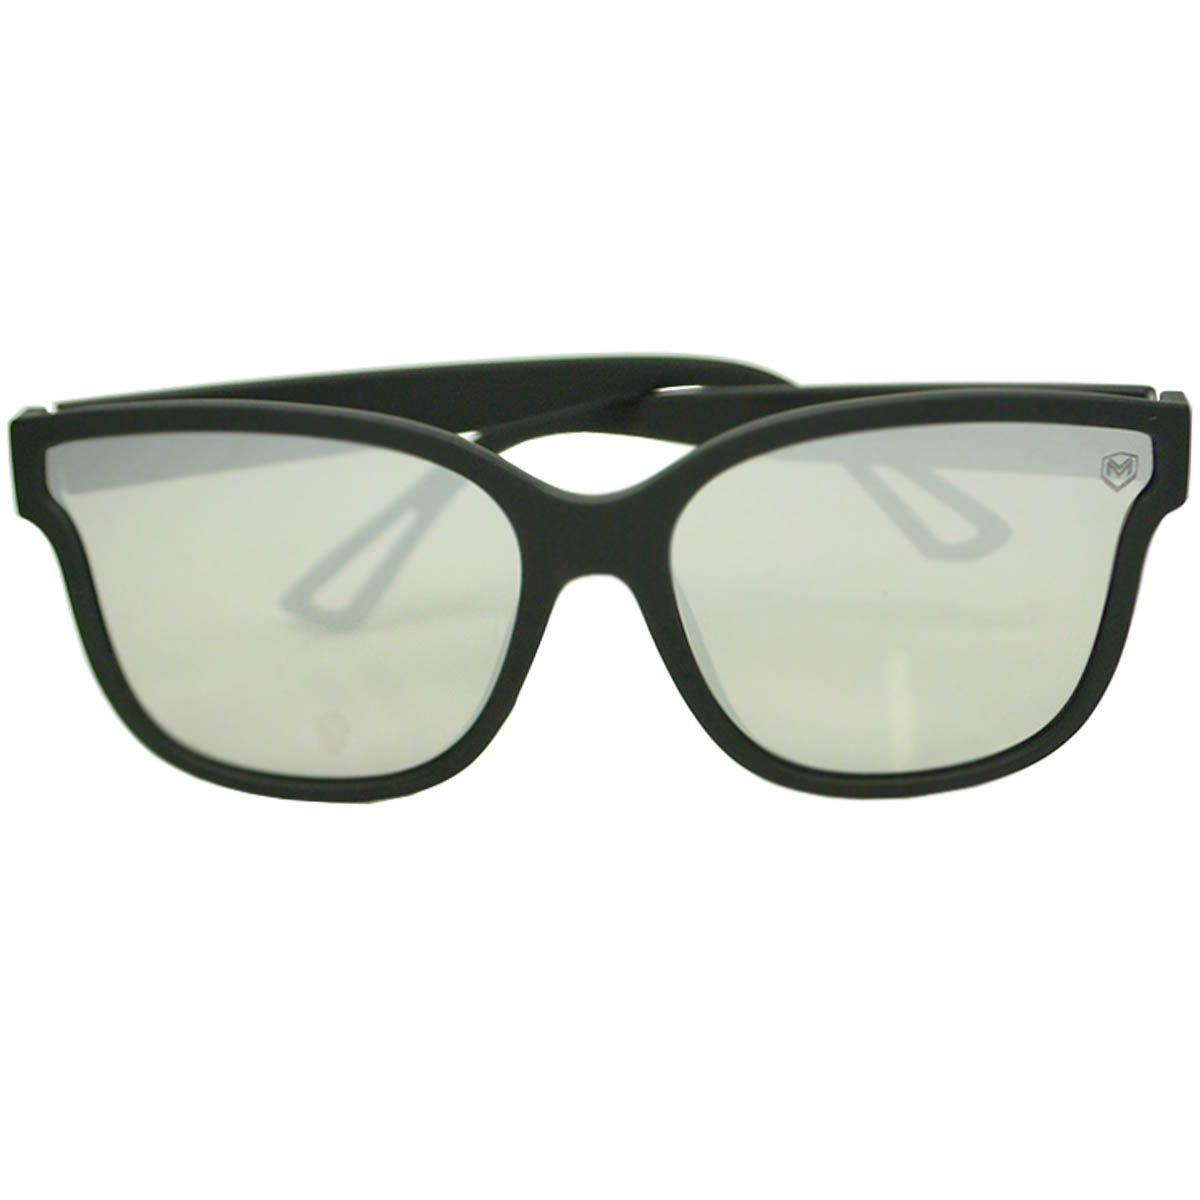 Óculos De Sol Mackage Unissex Acetato Gateado Fashion Oversize